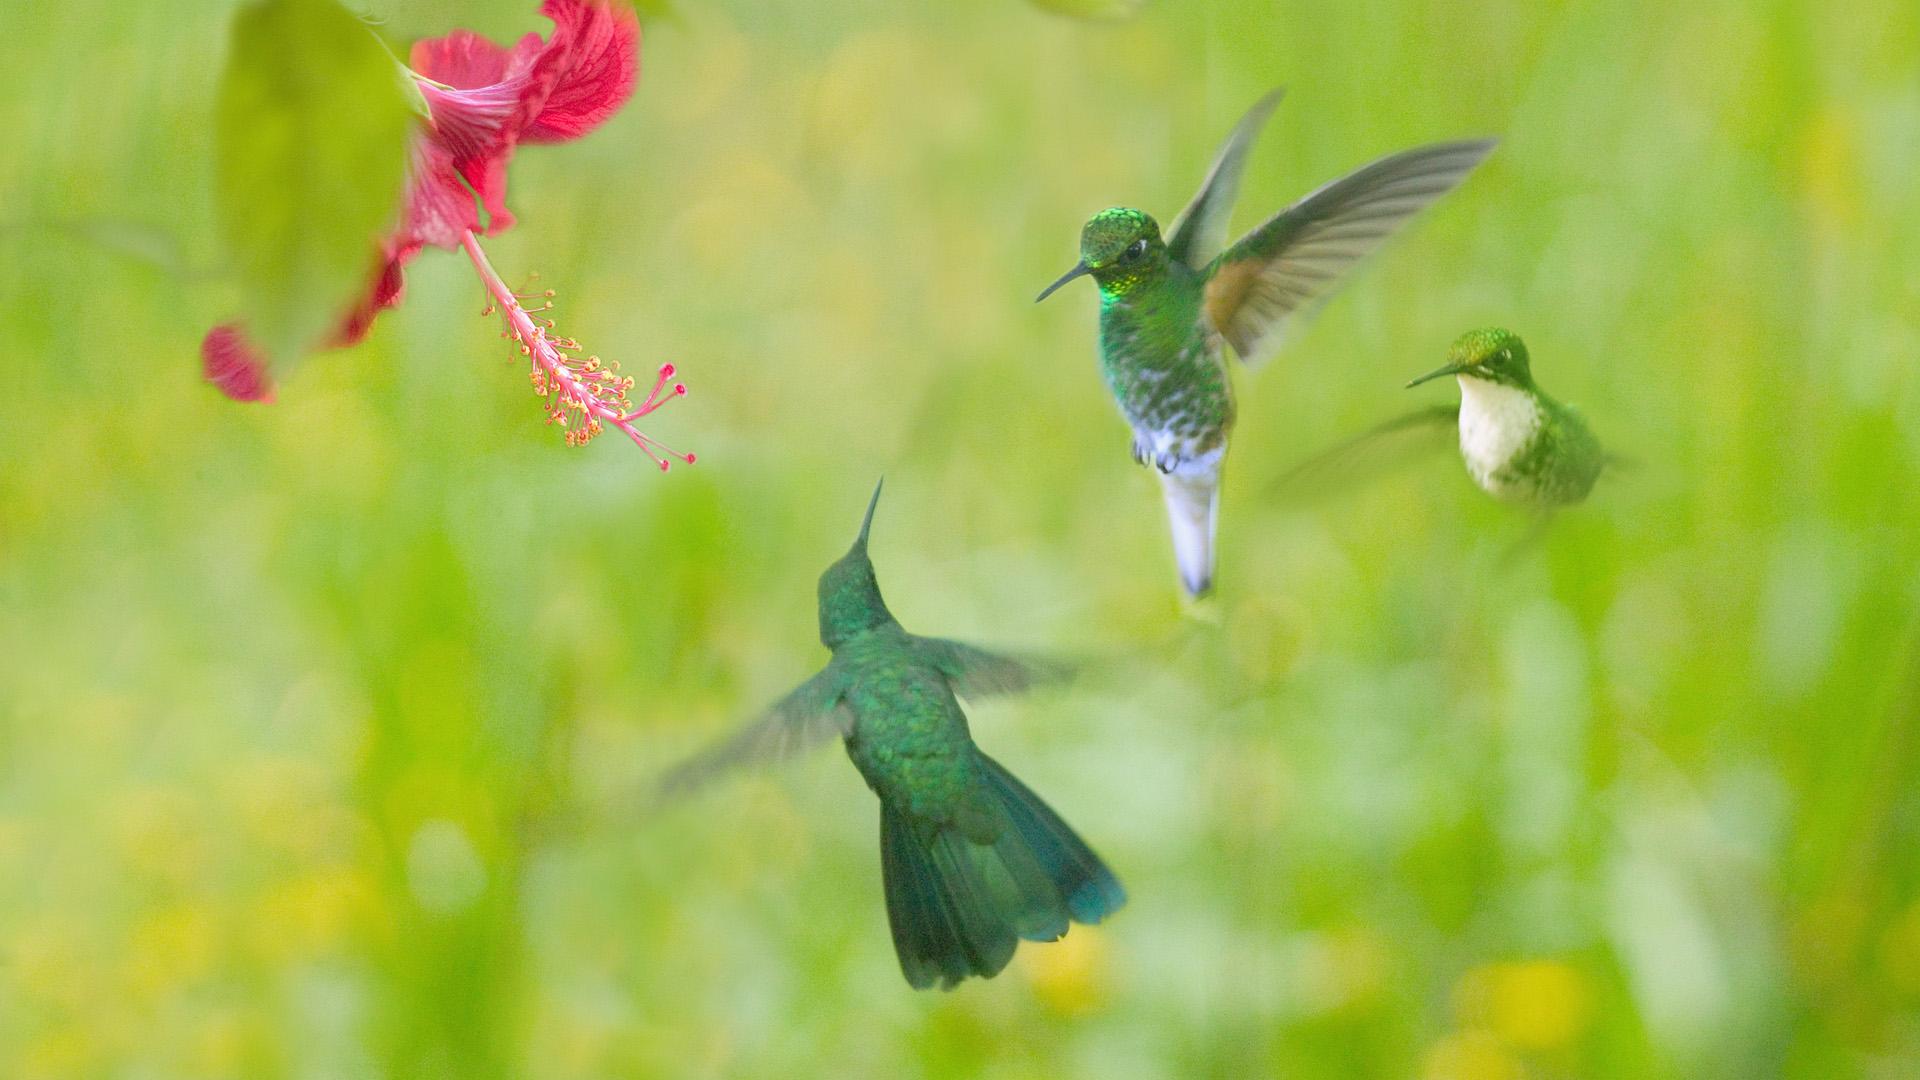 птица цветок  № 2034087 загрузить